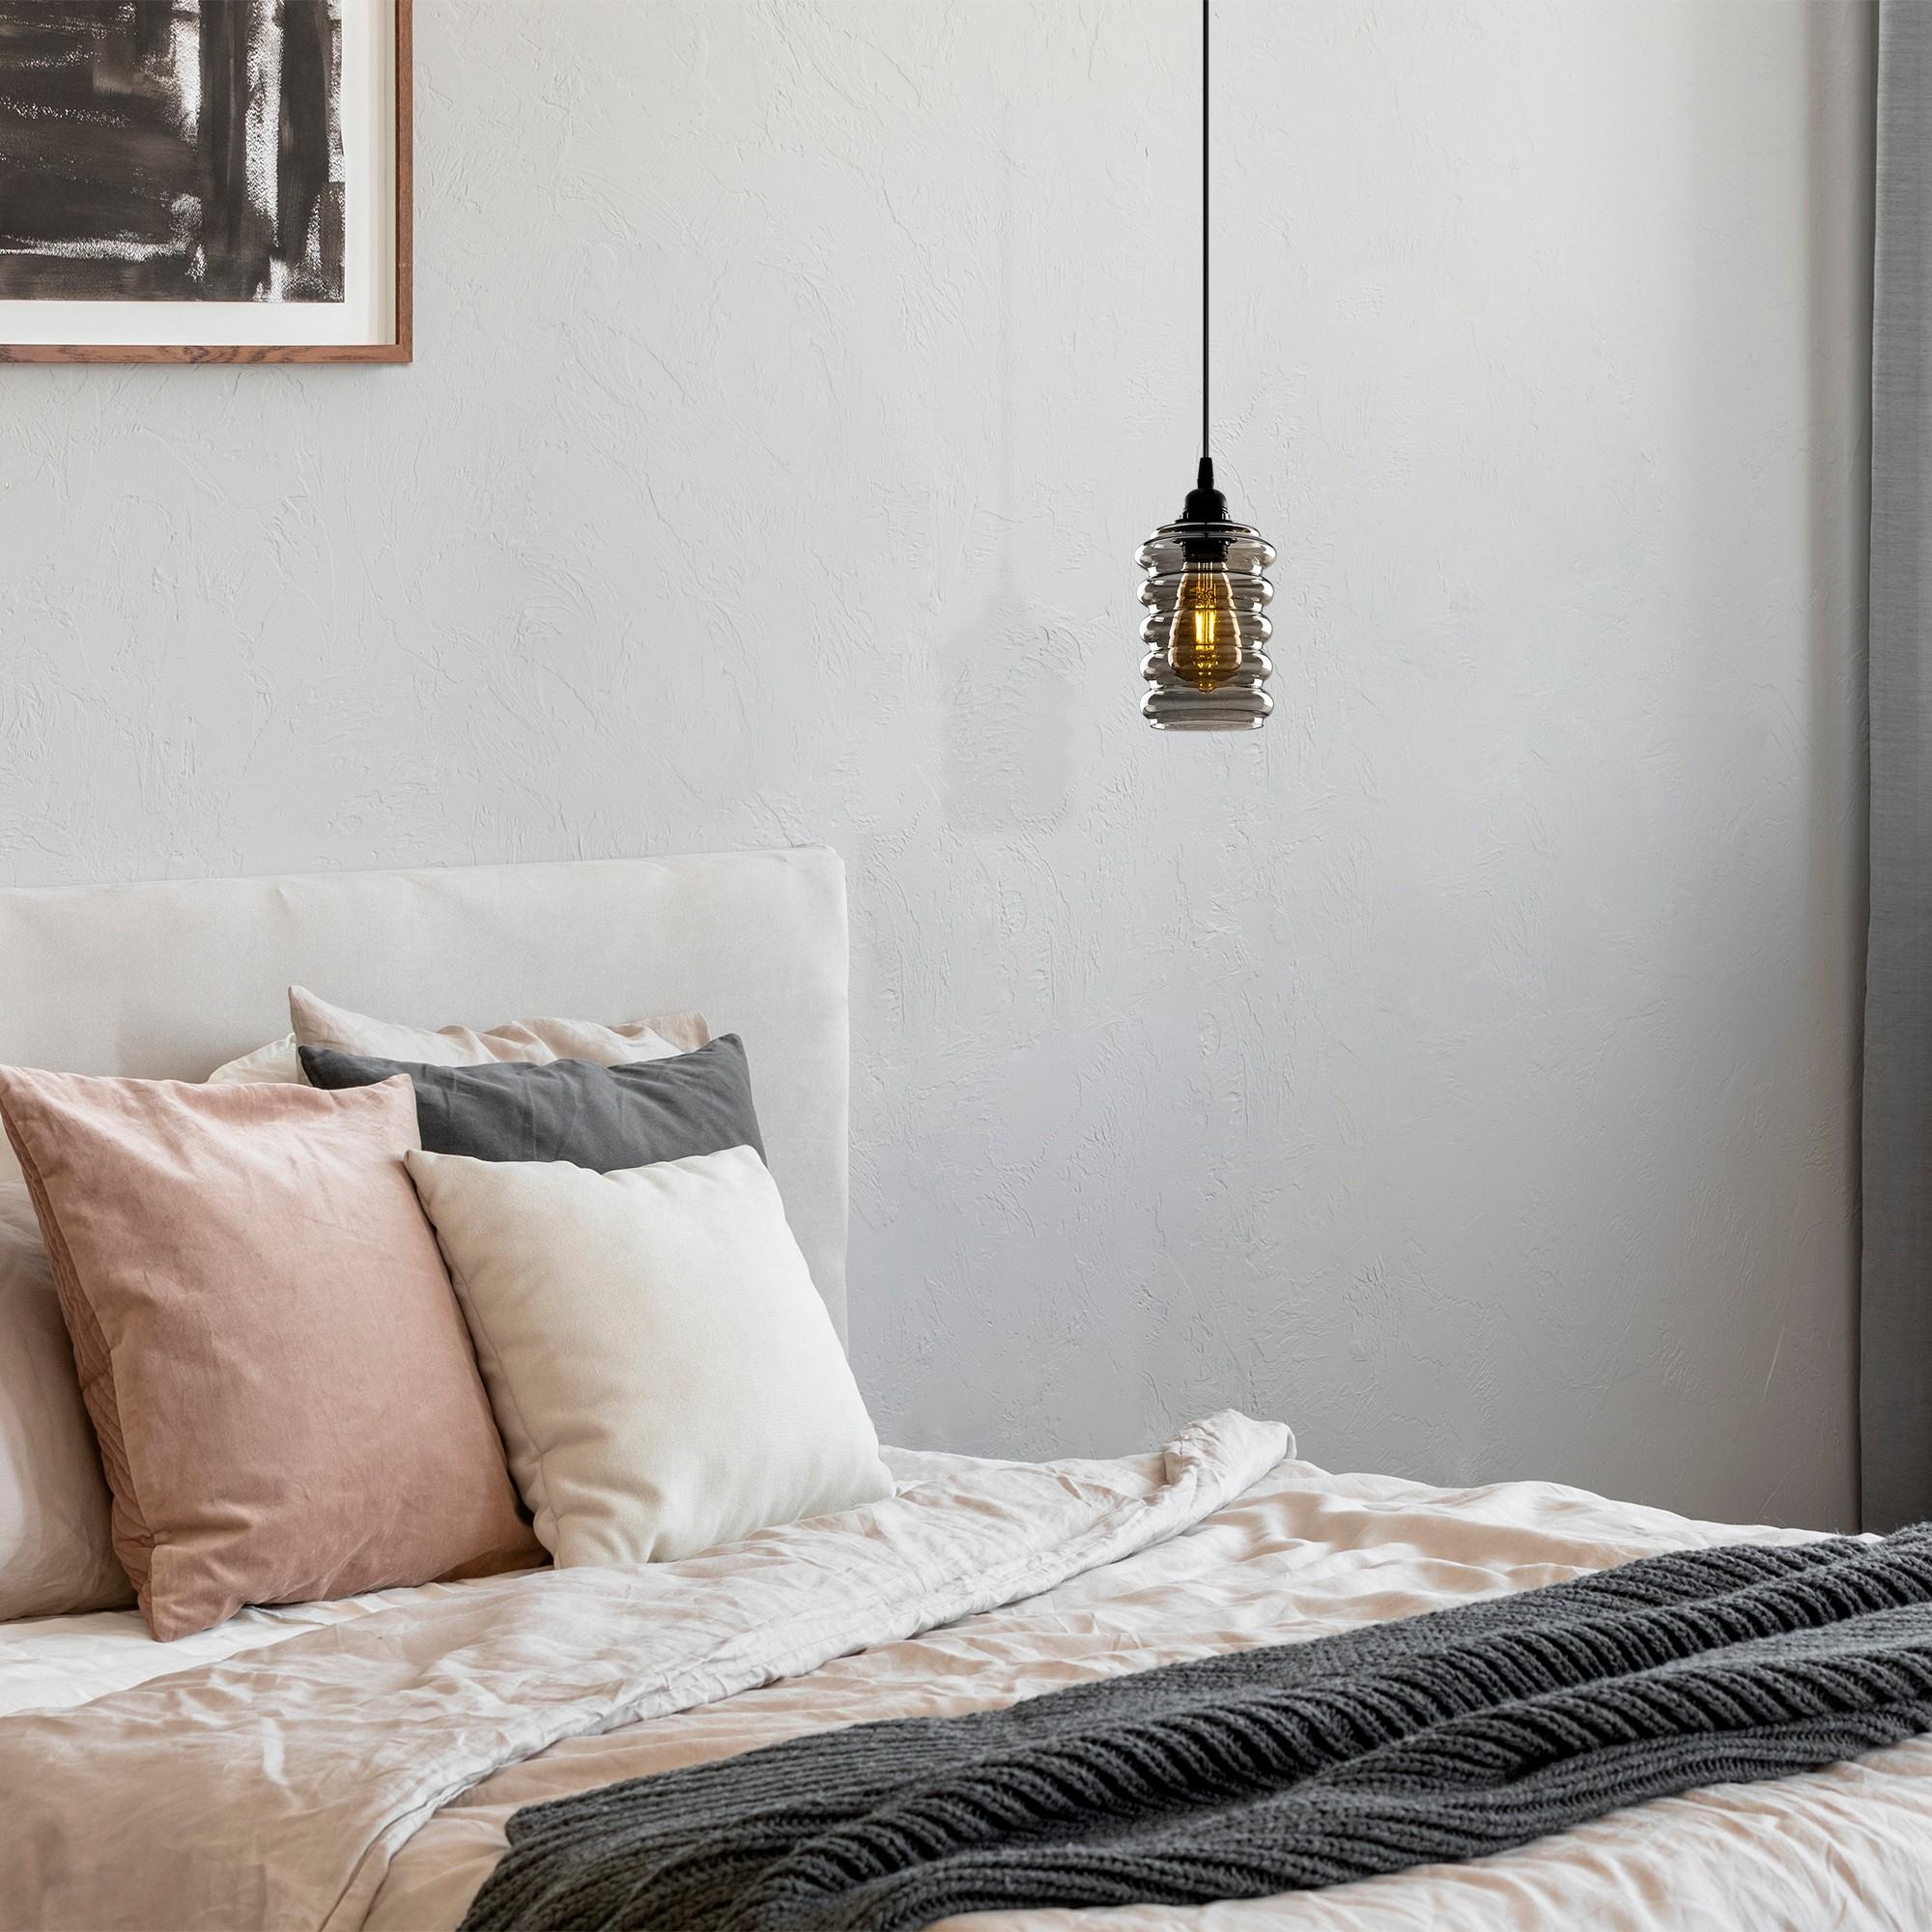 Hanglamp langwerpig smoked glass zwart e27 fitting - inrichting